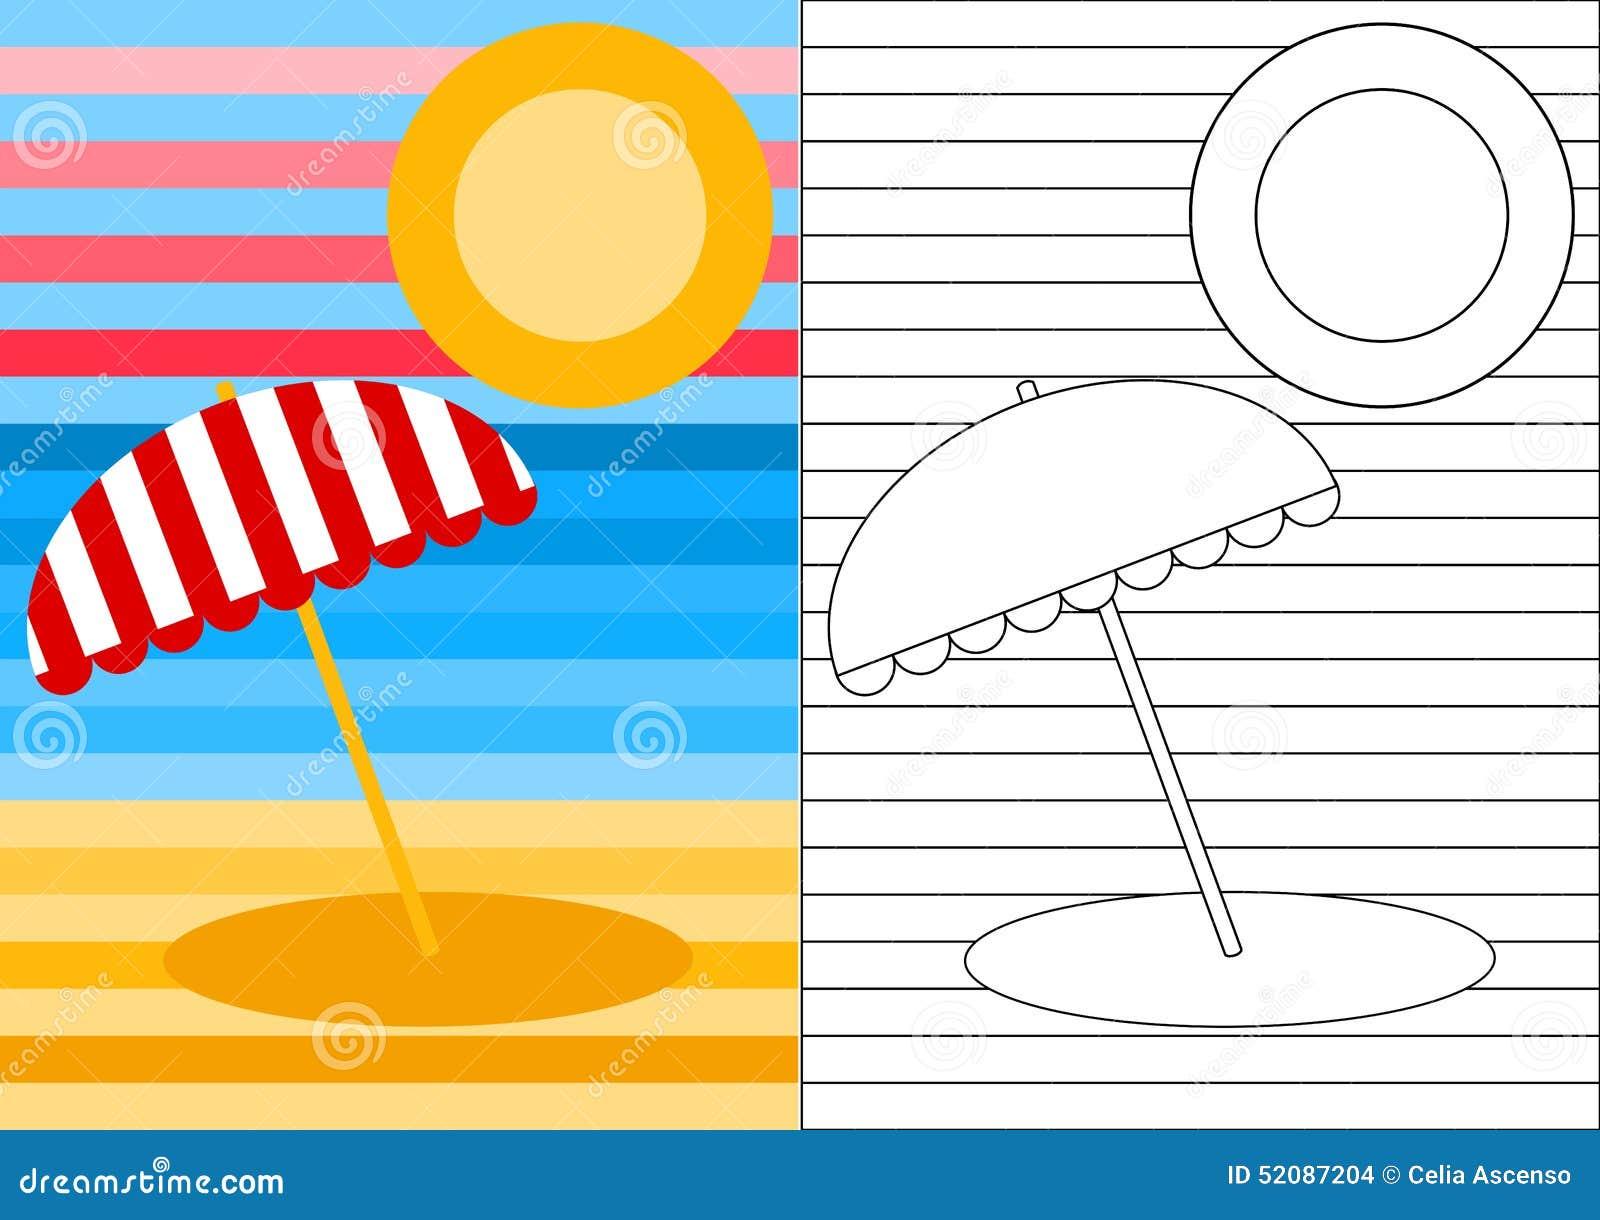 activity beach color - Color Activity